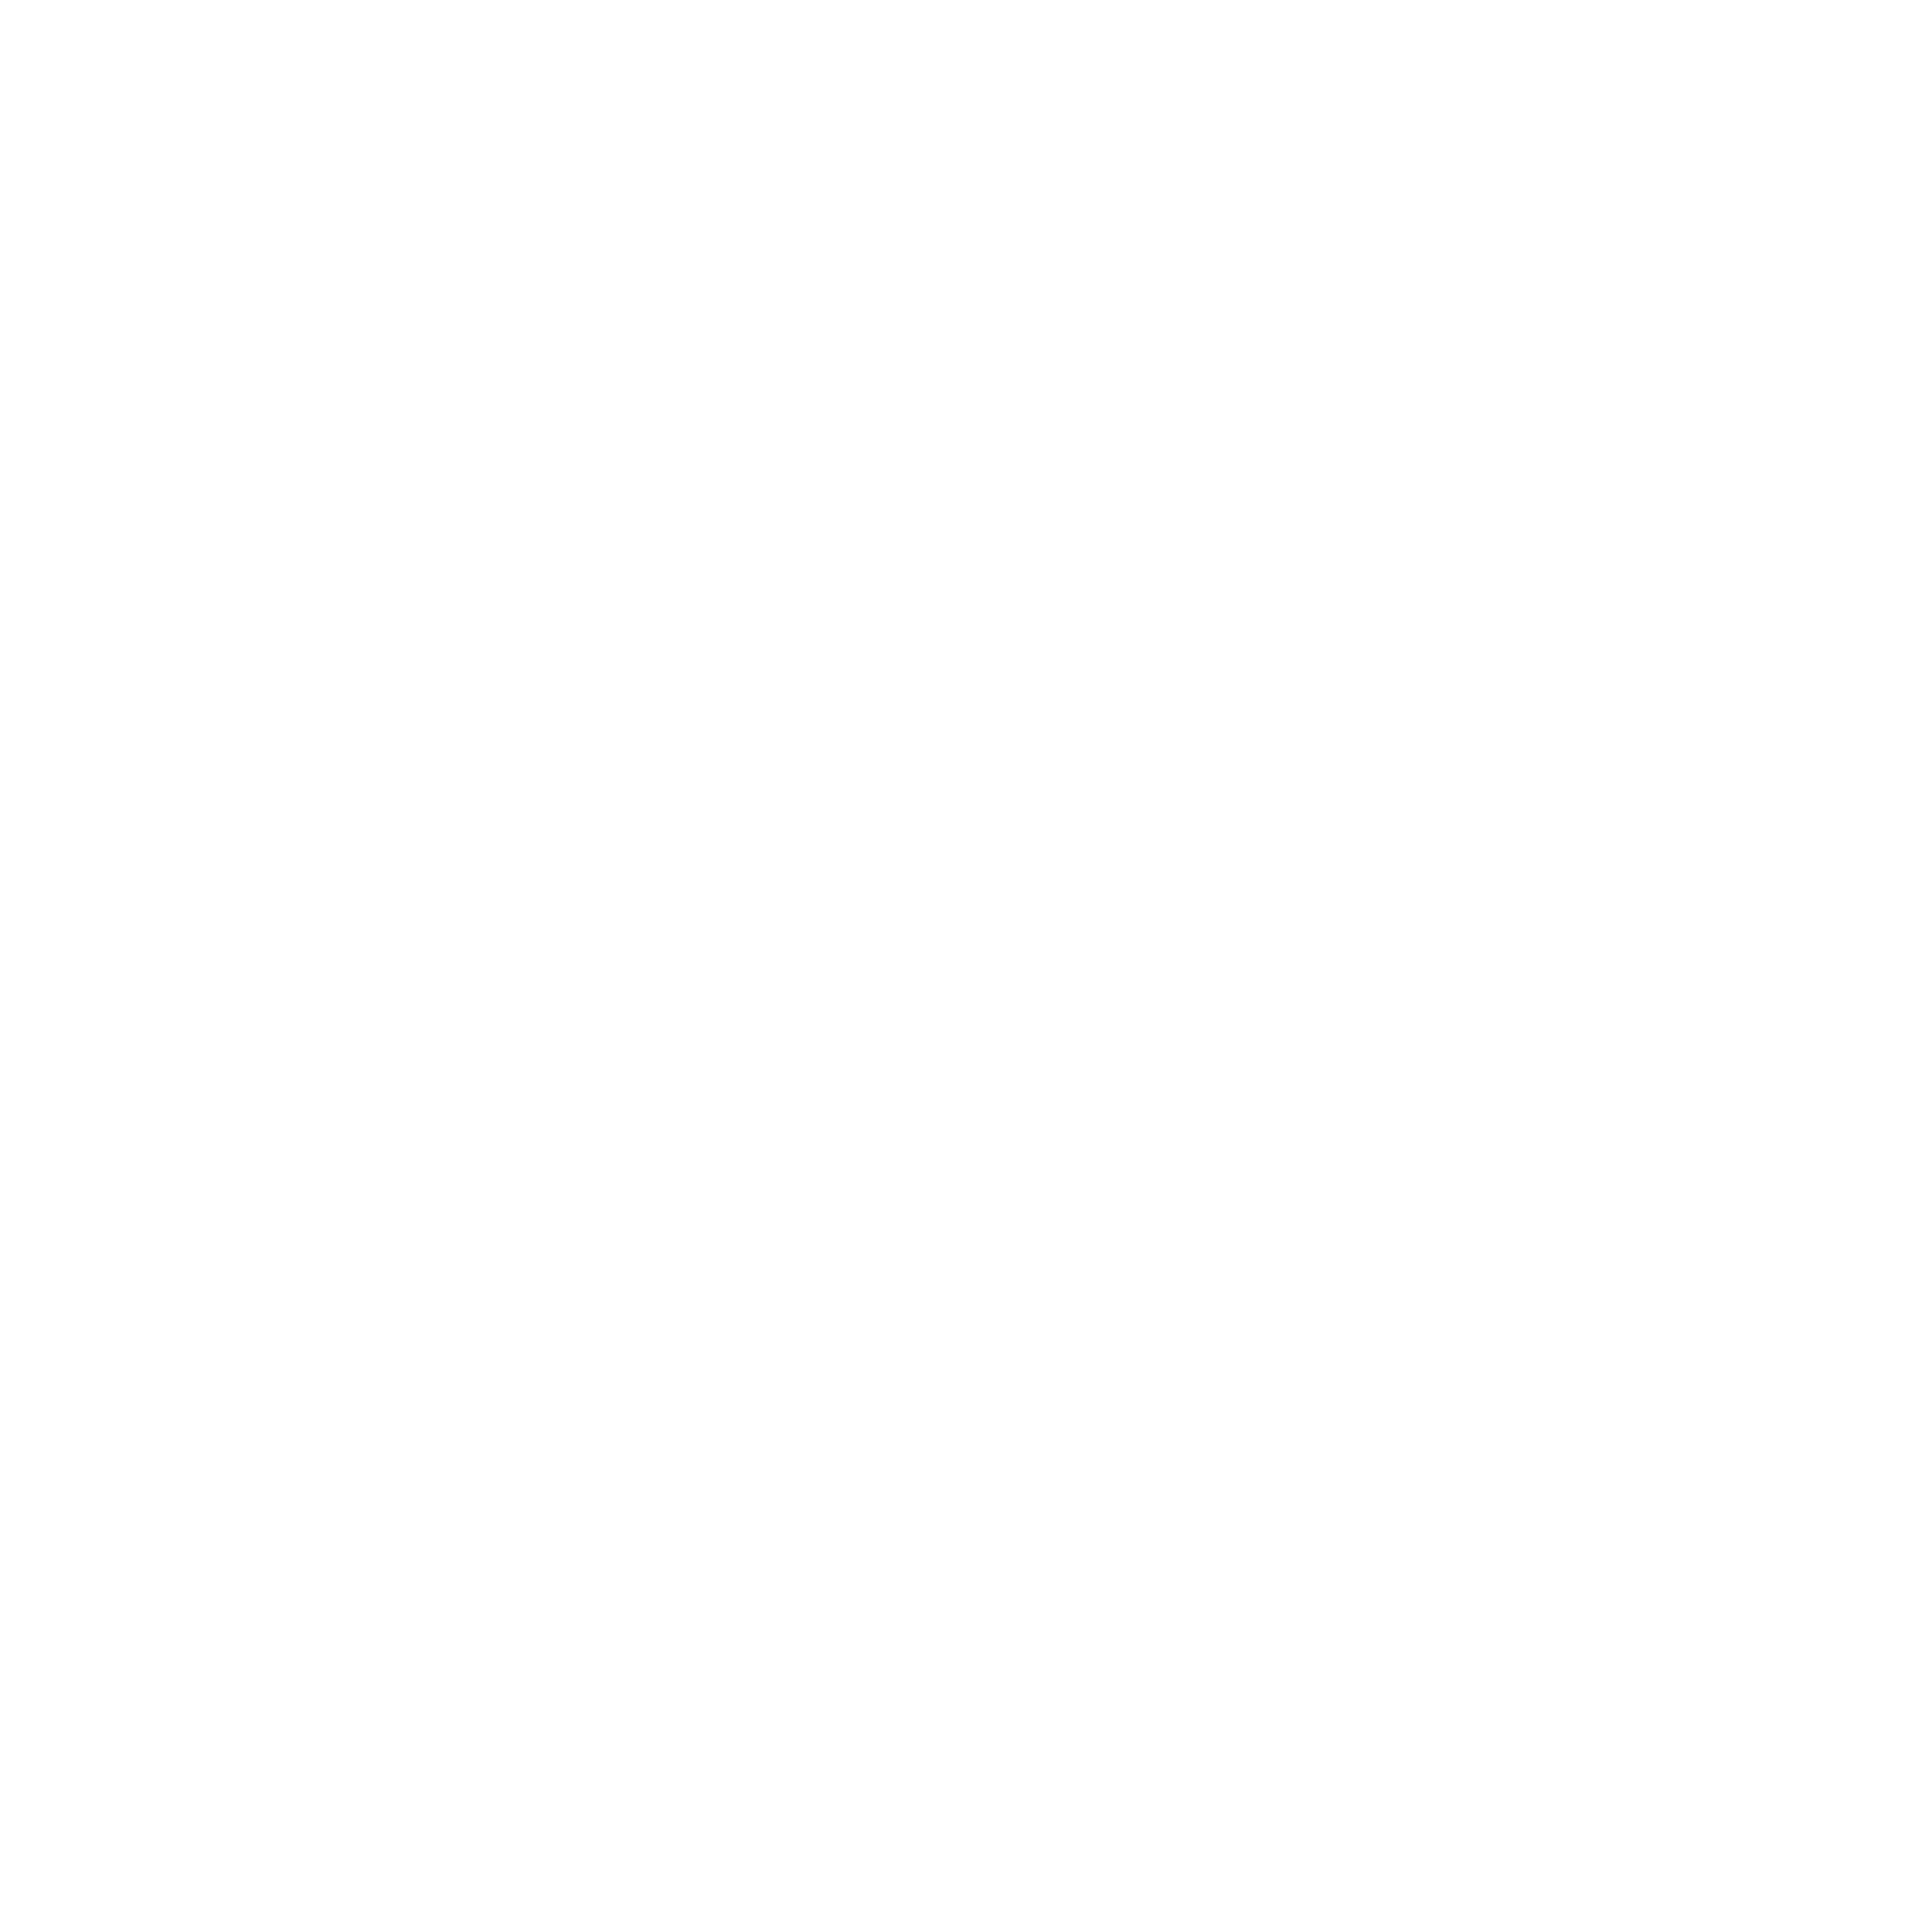 zoe willem